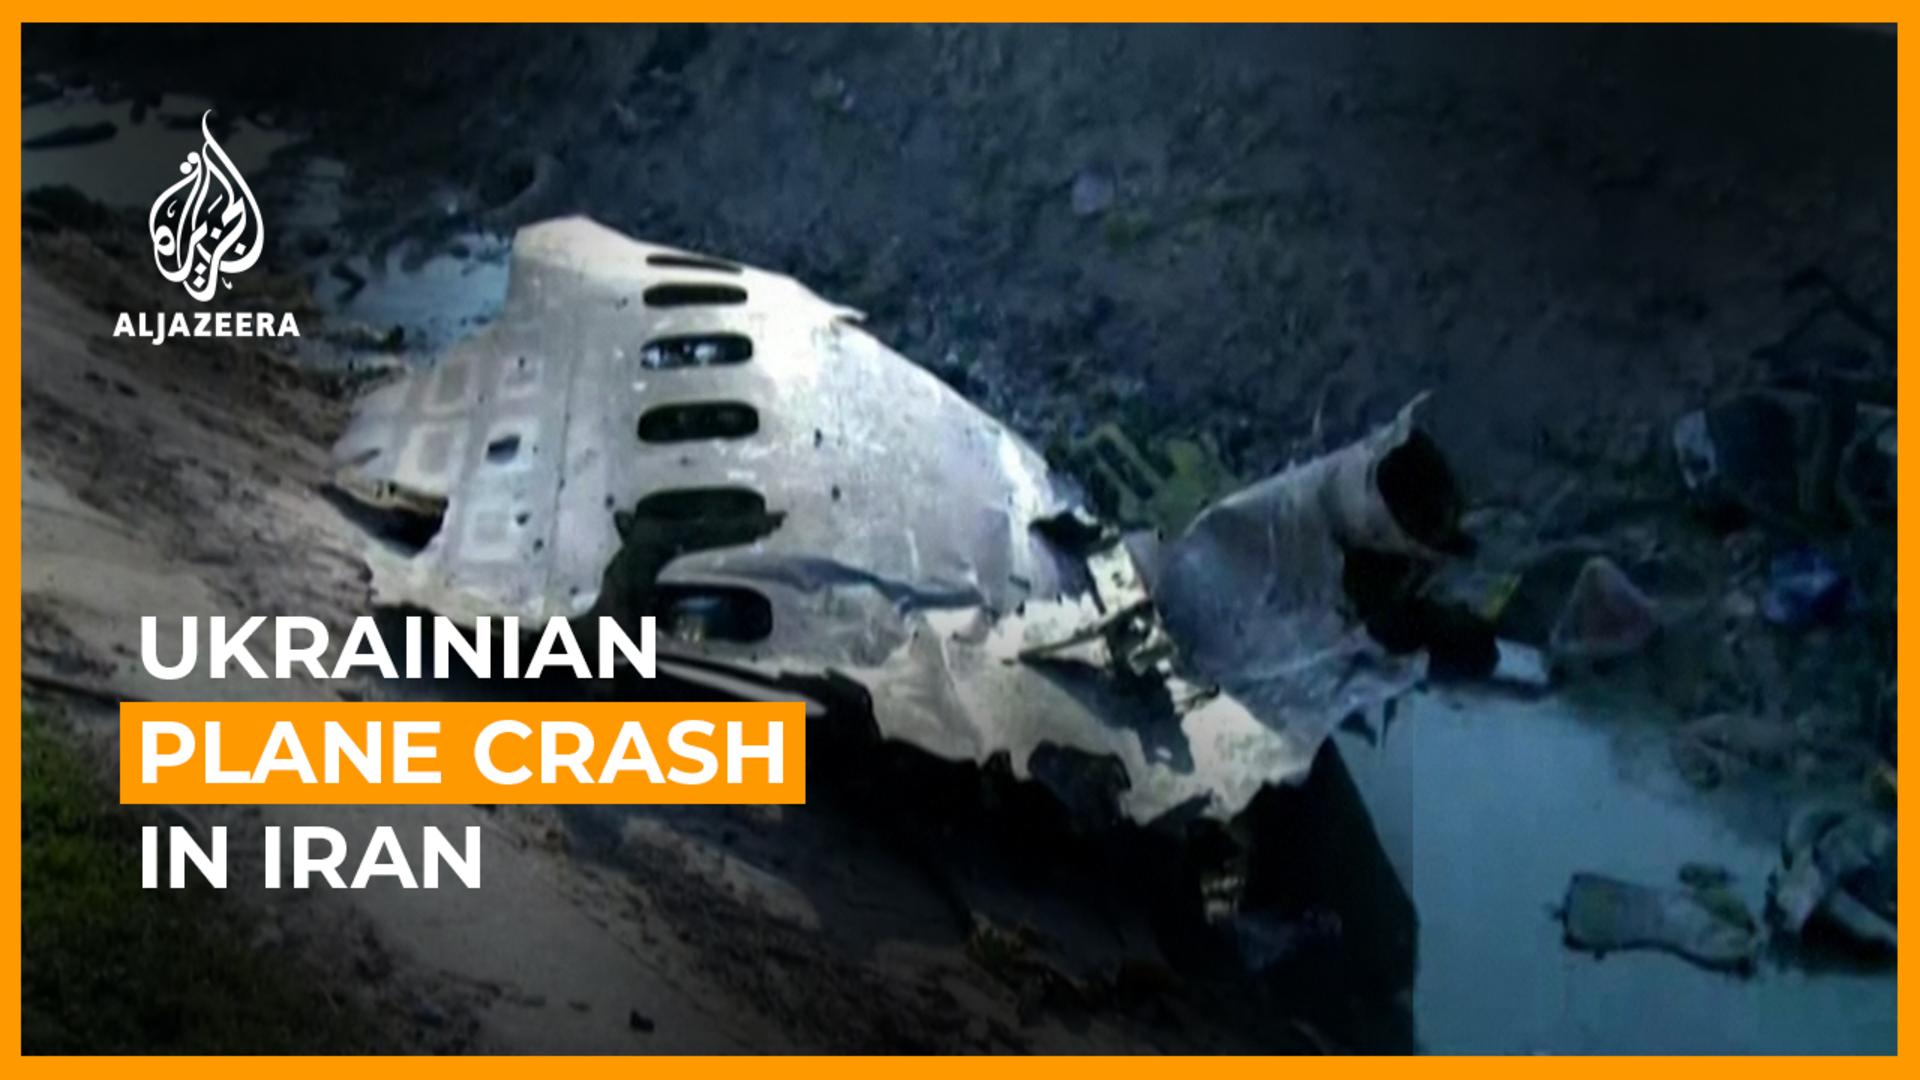 'No survivors': Ukrainian jet crashes in Iran with 176 on board